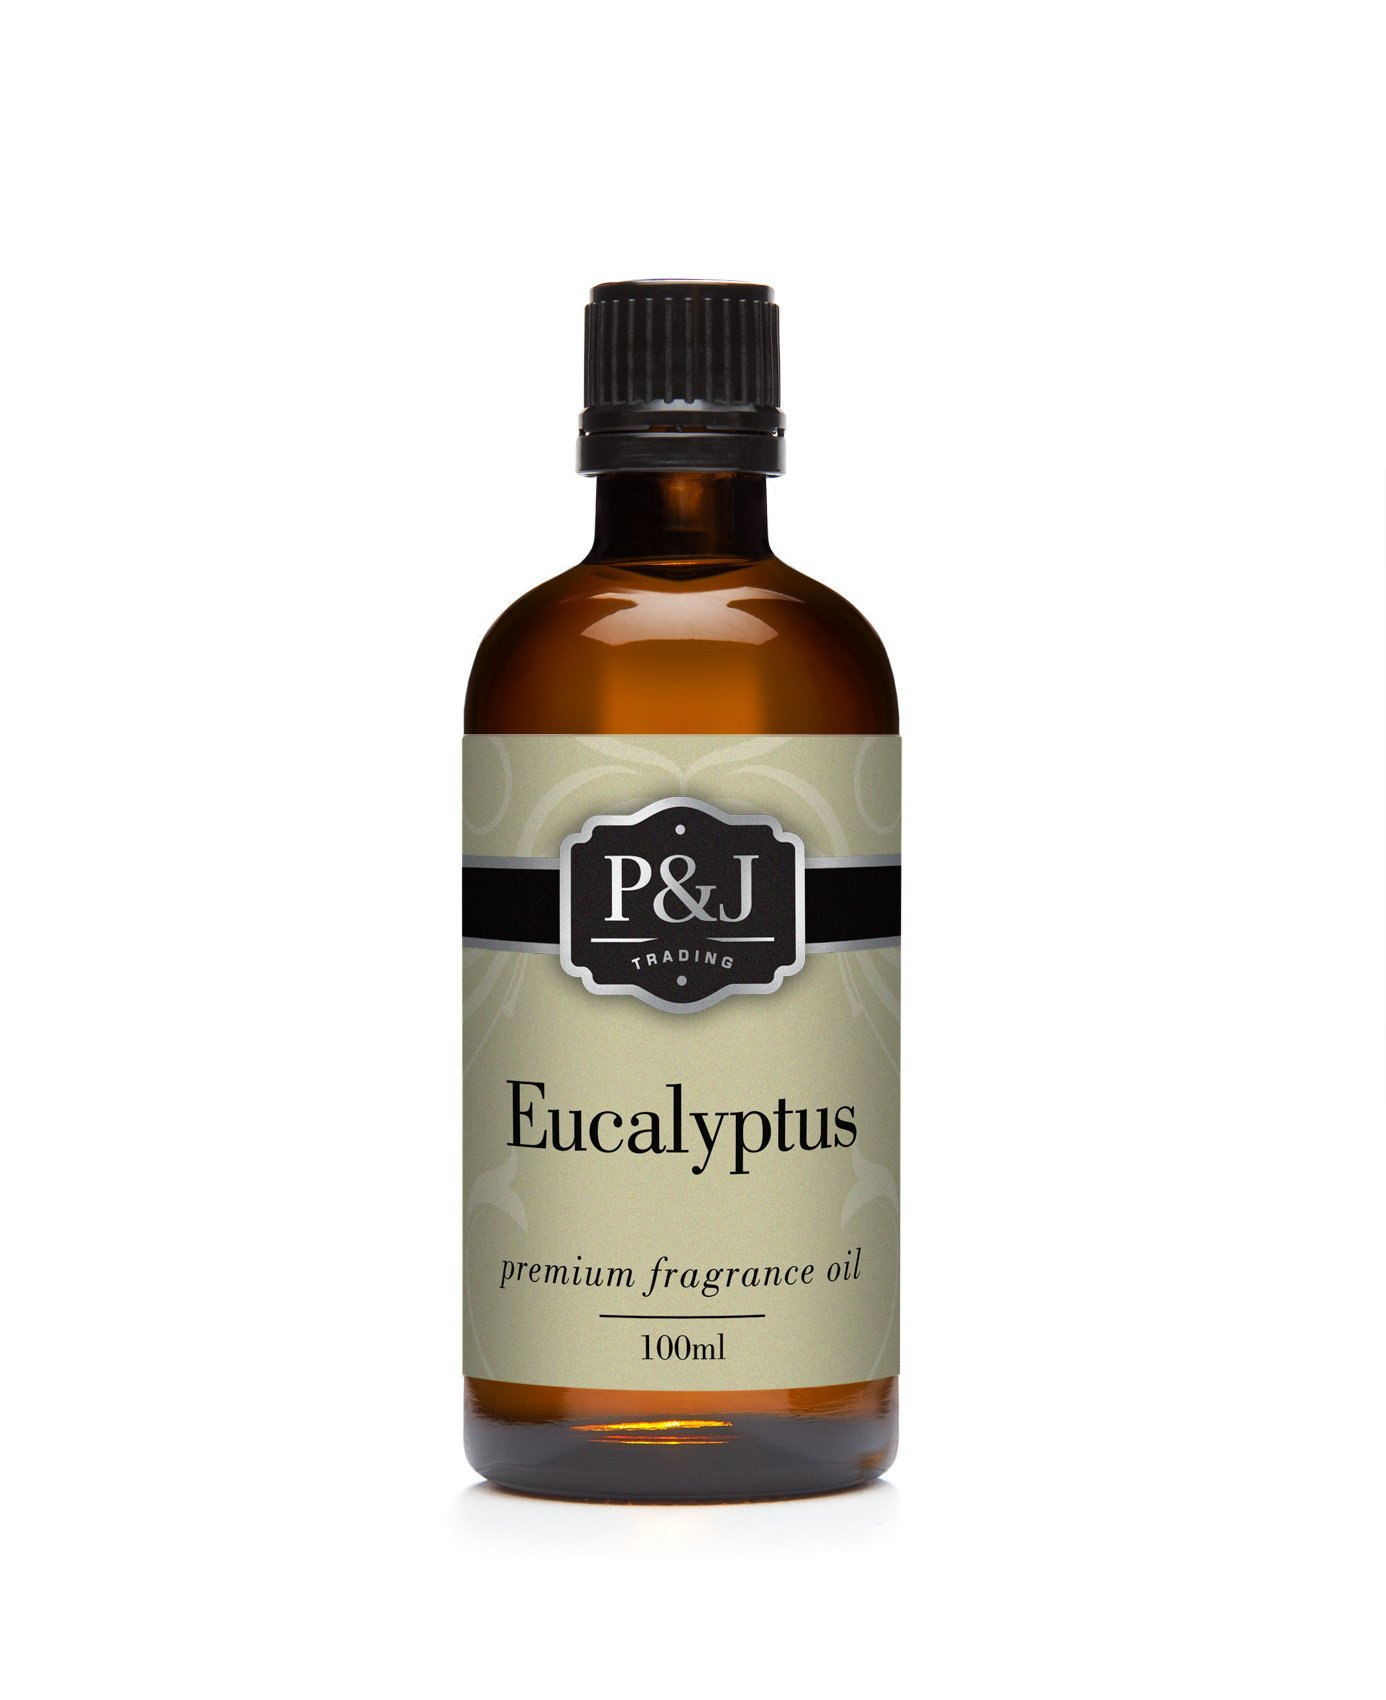 Eucalyptus Fragrance Oil - Premium Grade Scented Oil - 100ml/3.3oz